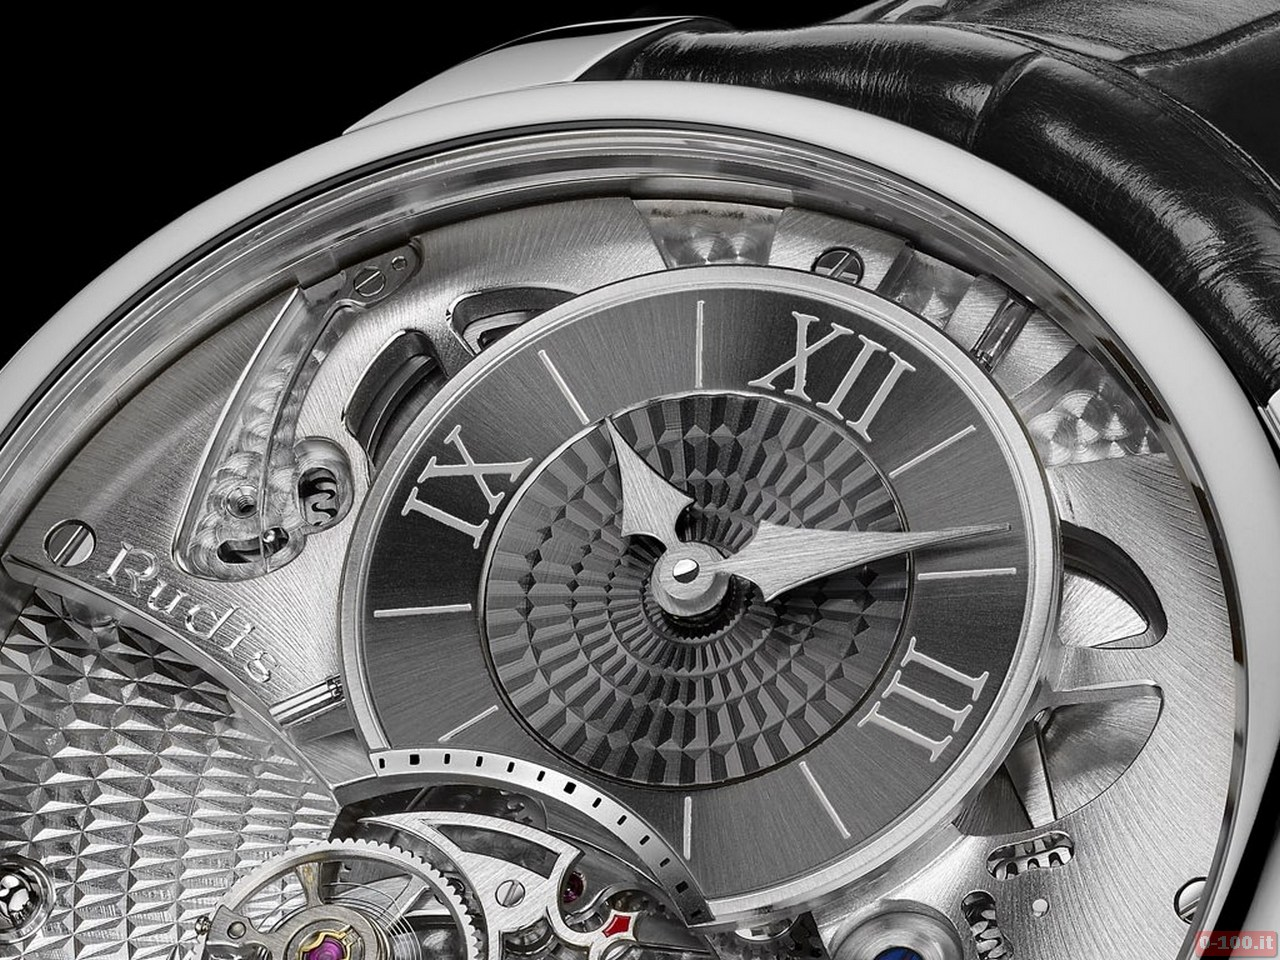 rudis-sylva-rs12-grand-art-horloger_0-100_3